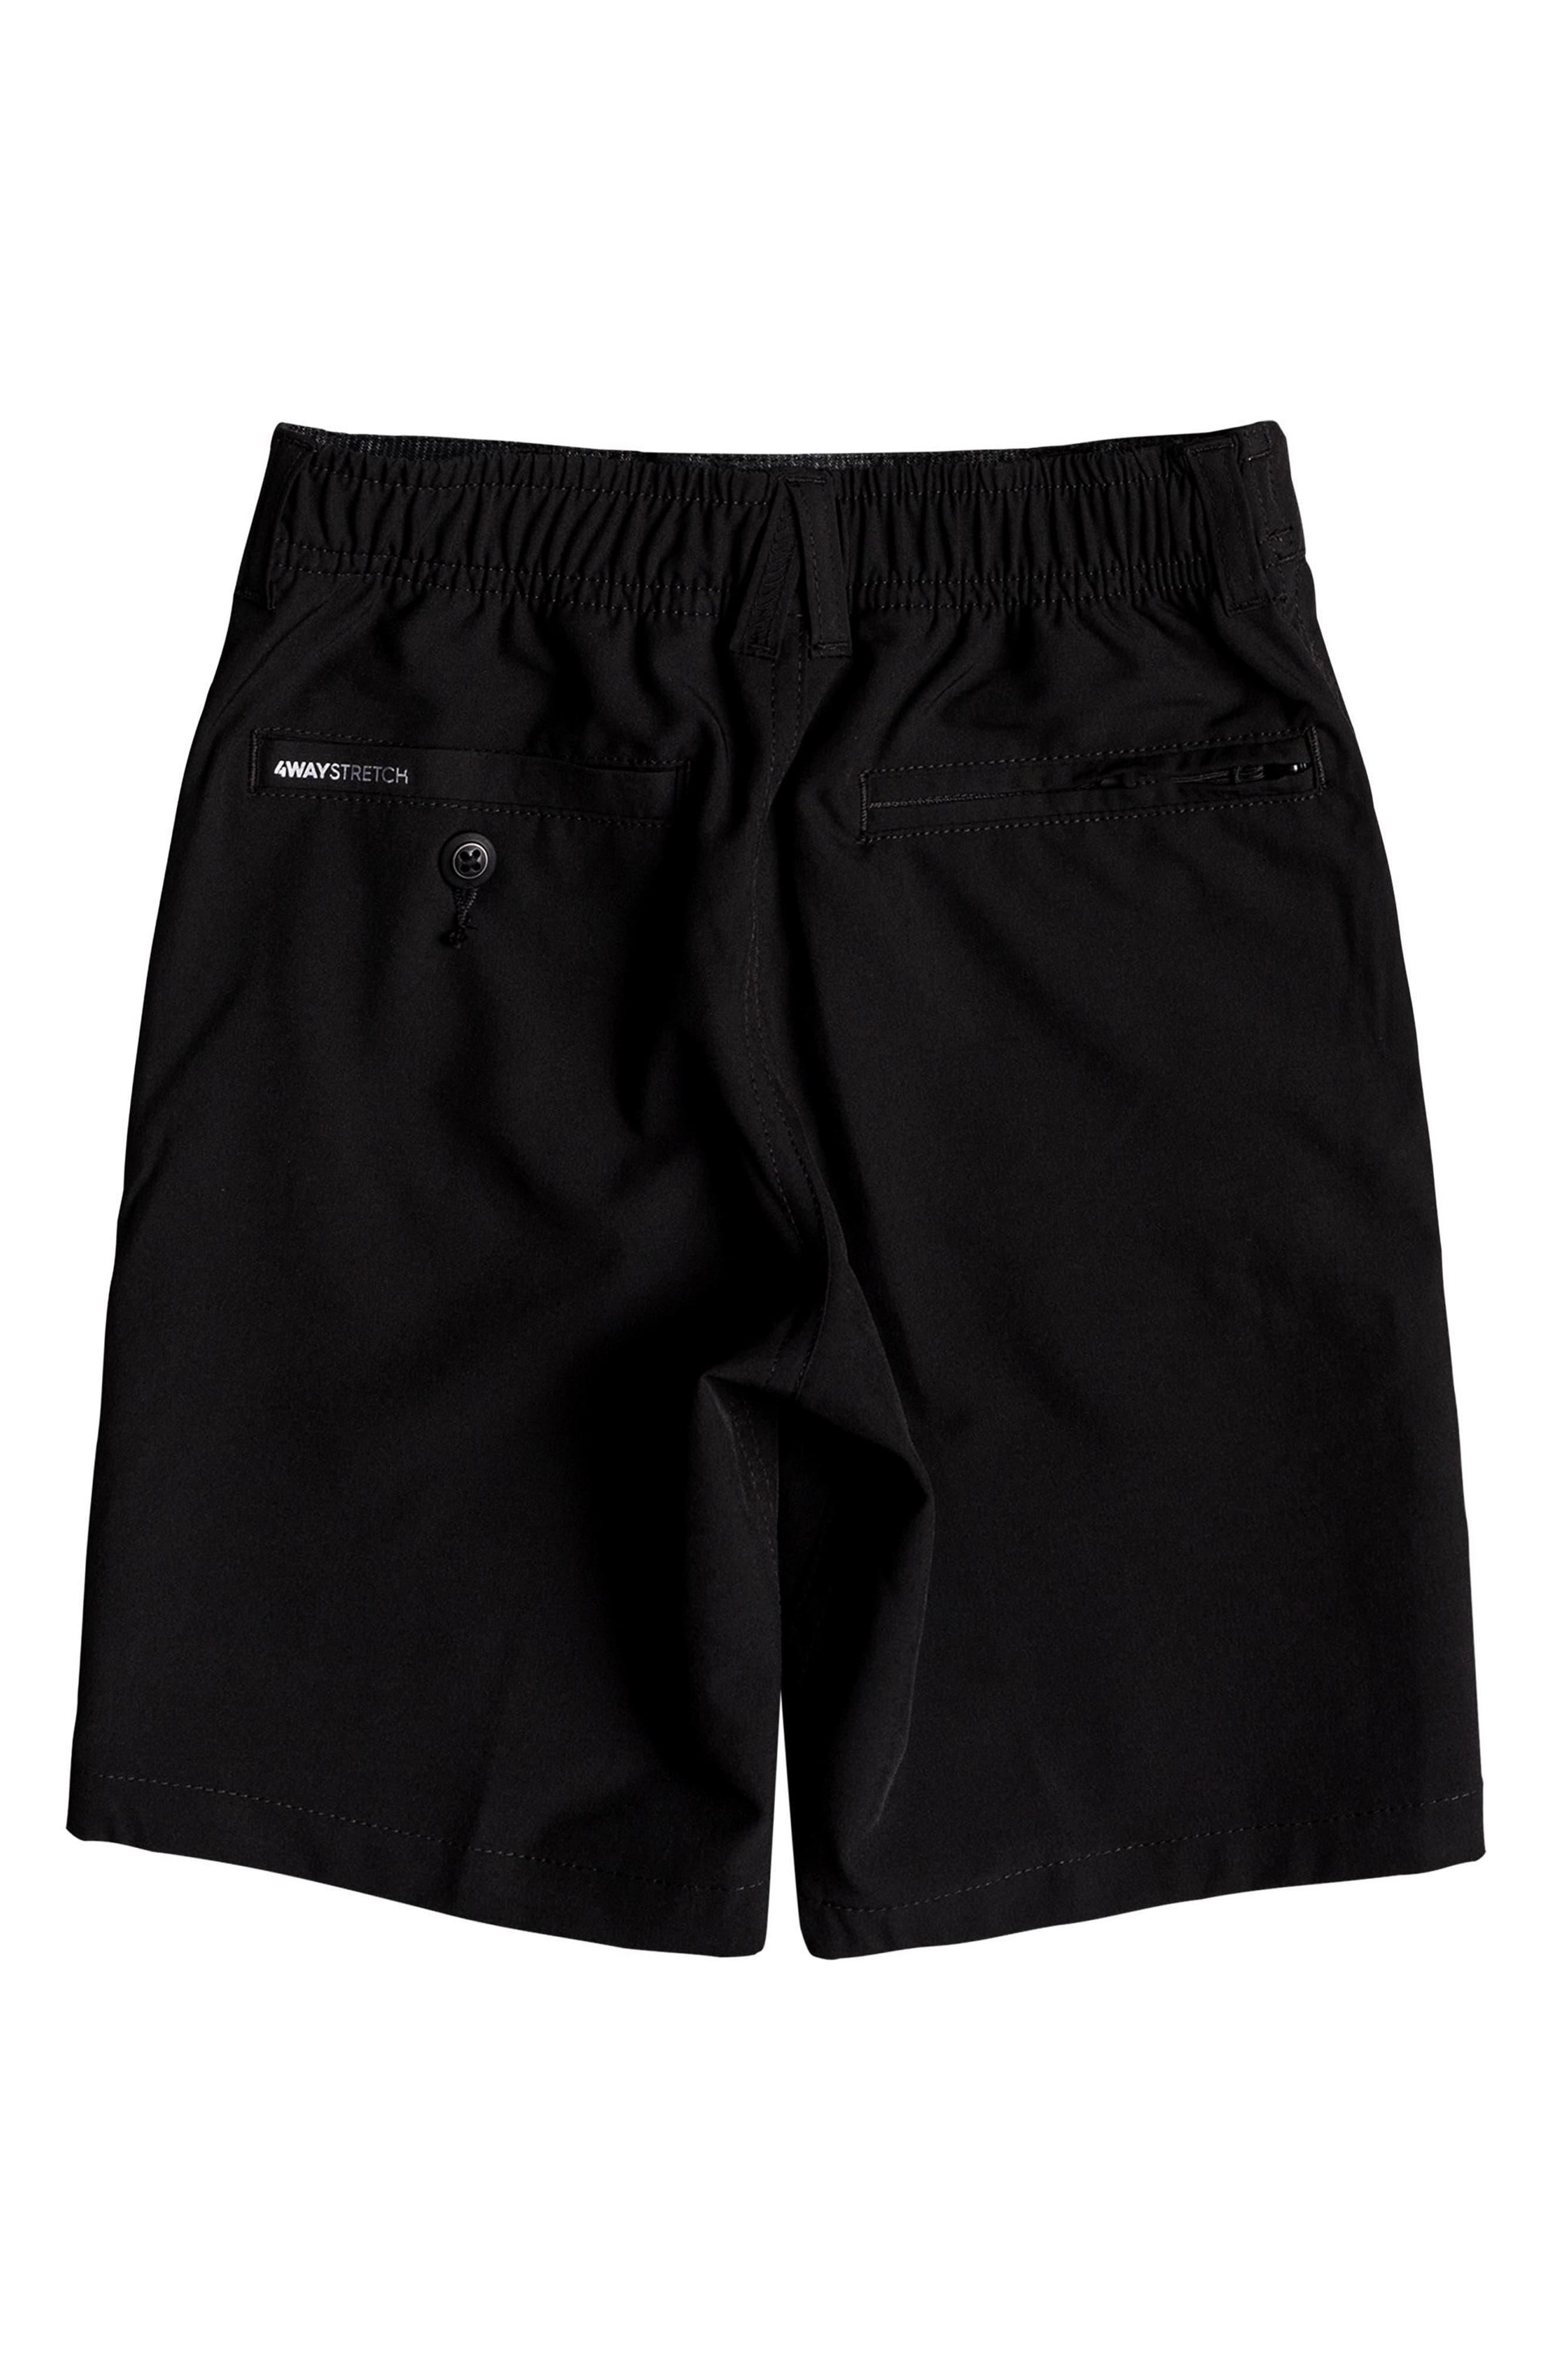 QUIKSILVER,                             Union Amphibian Hybrid Shorts,                             Alternate thumbnail 2, color,                             BLACK